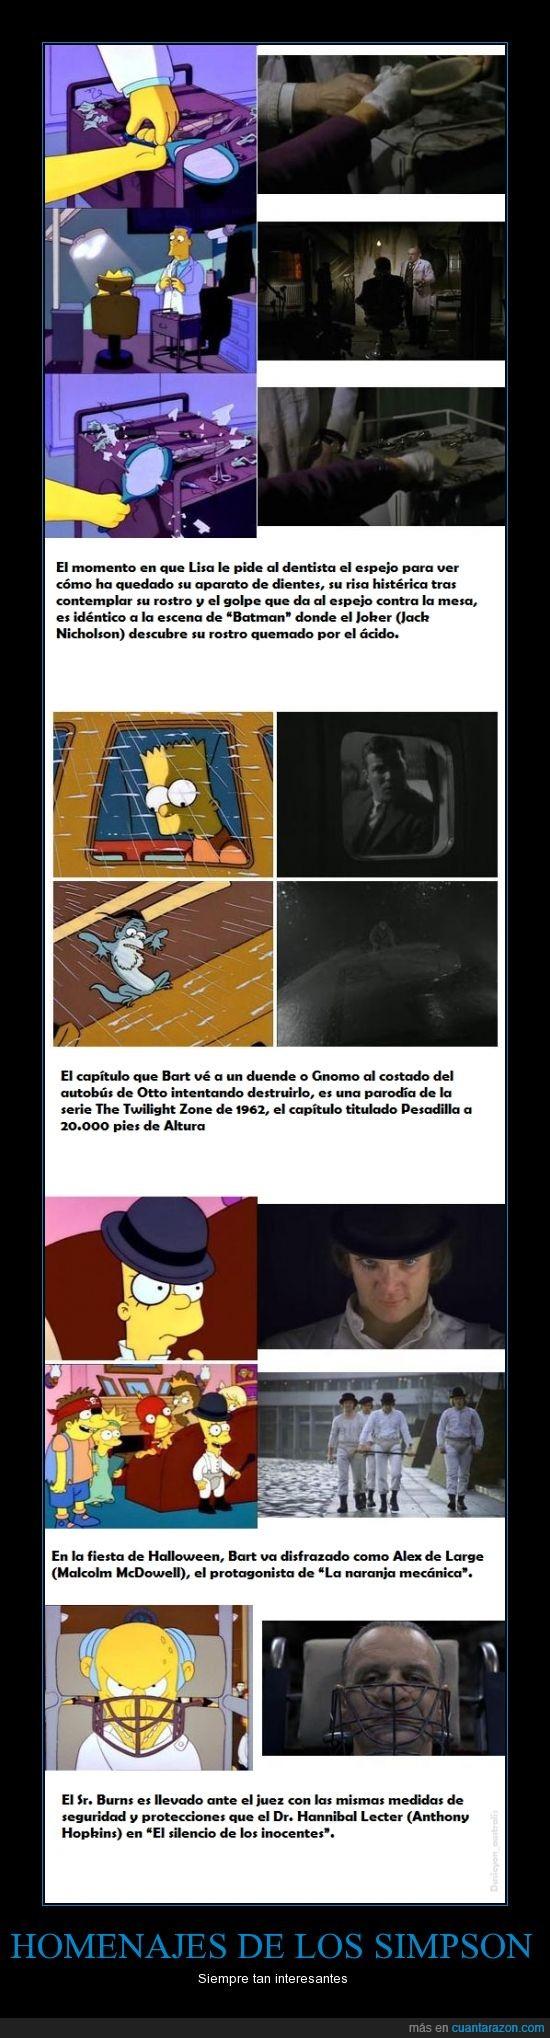 Batman,Hannibal,La naranja mecanica,Los simpson,Parodias,The Jocker